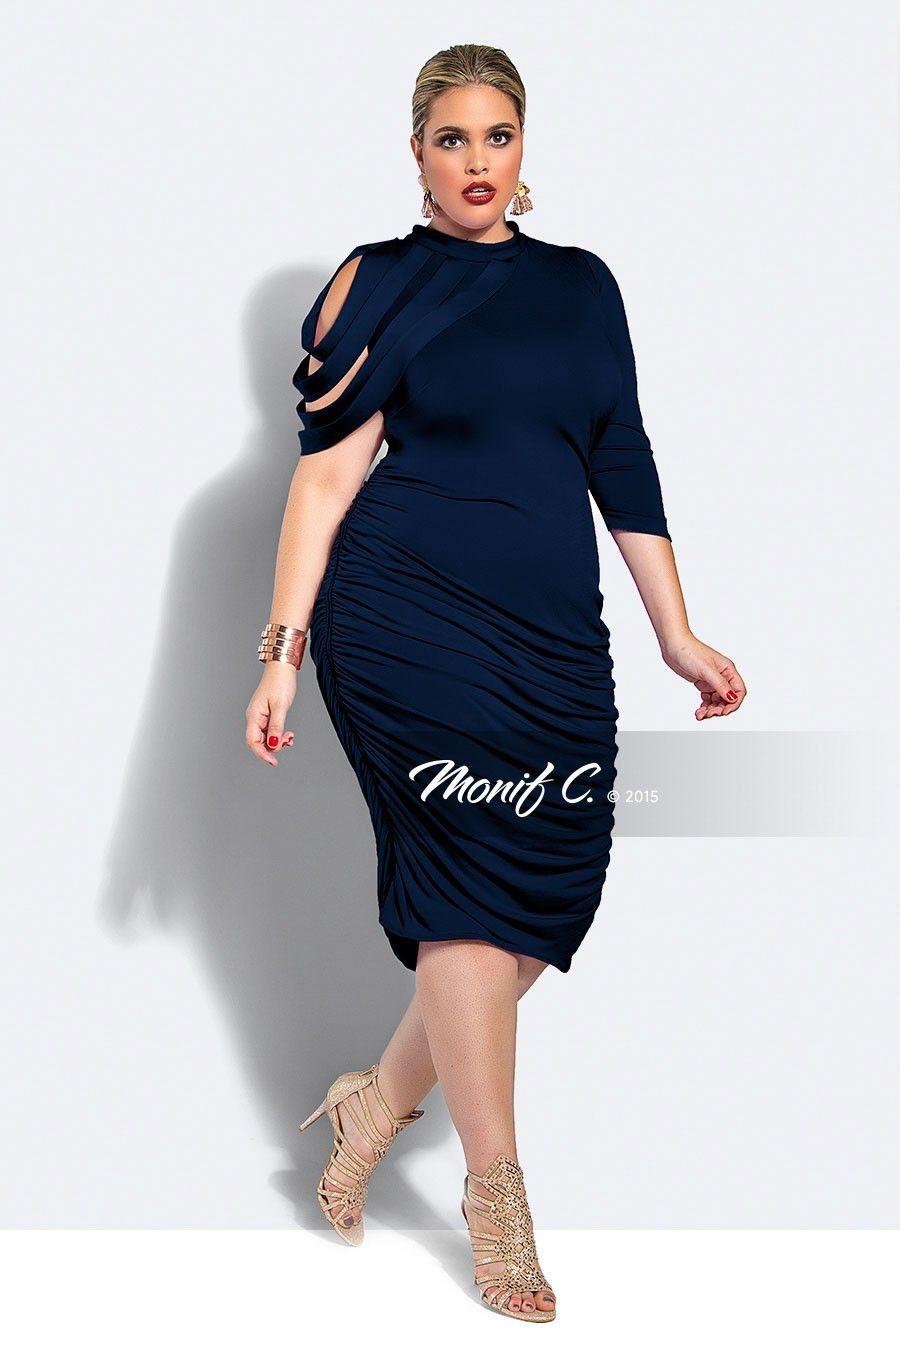 pin de caronte essis en outfits variados para curvis pinterest mode kleider y extravagante. Black Bedroom Furniture Sets. Home Design Ideas